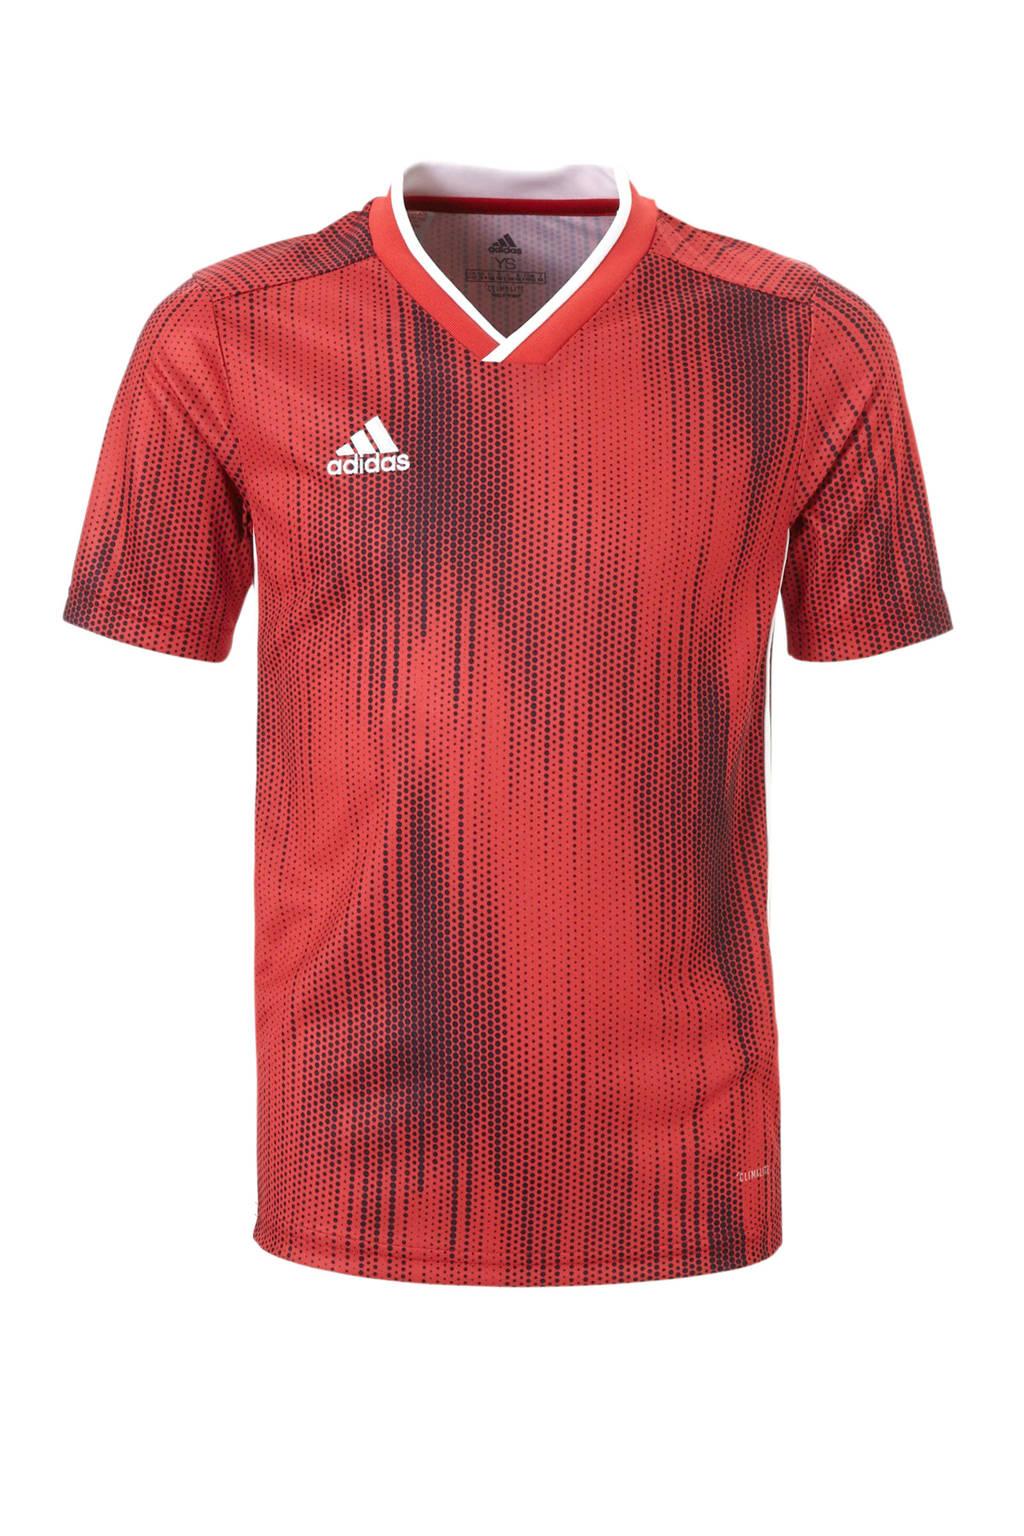 adidas performance Junior  sport T-shirt Tiro rood, Jongens/meisjes